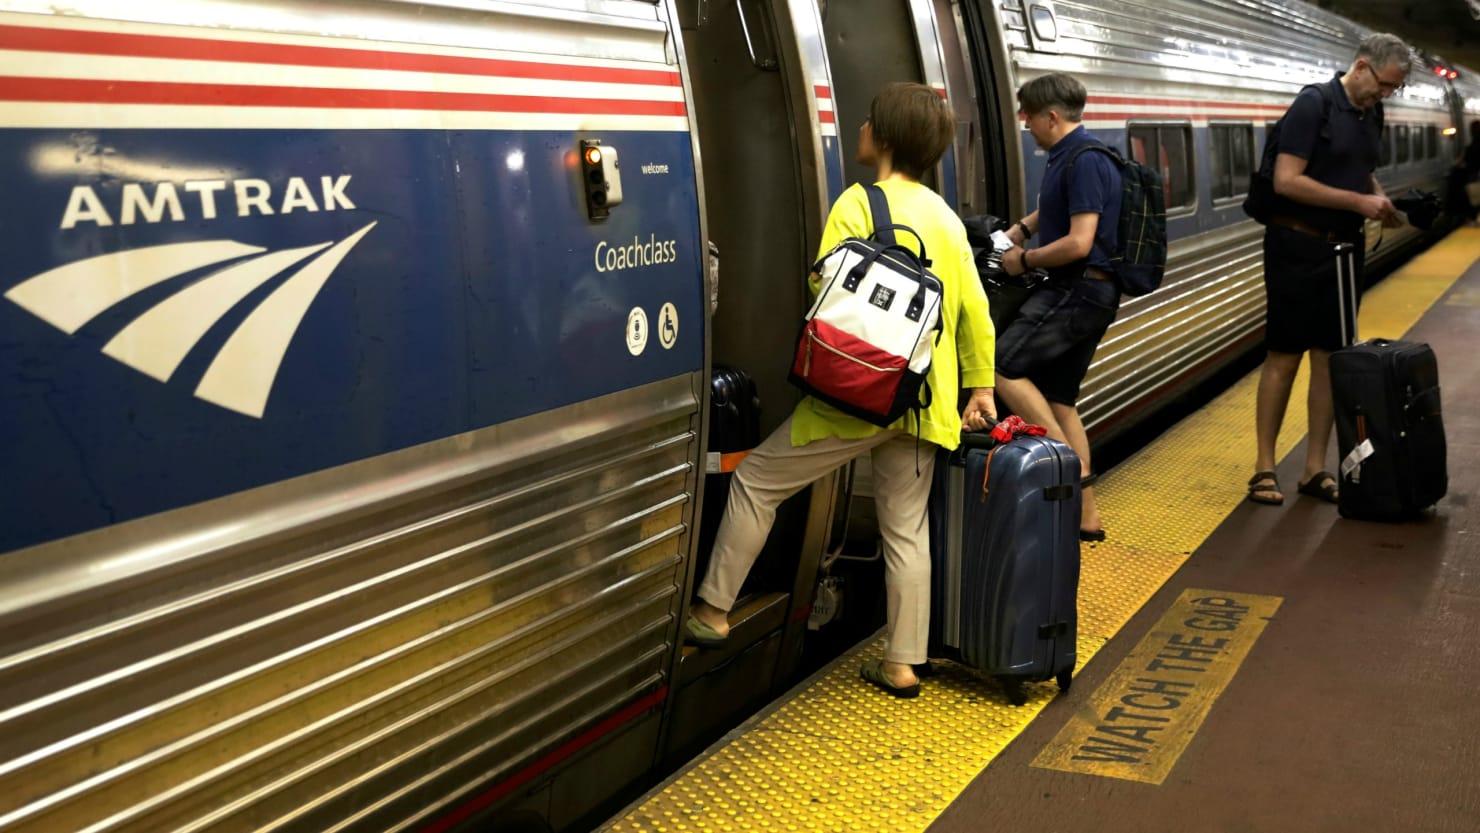 White Supremacist planned to injure Amtrak passengers